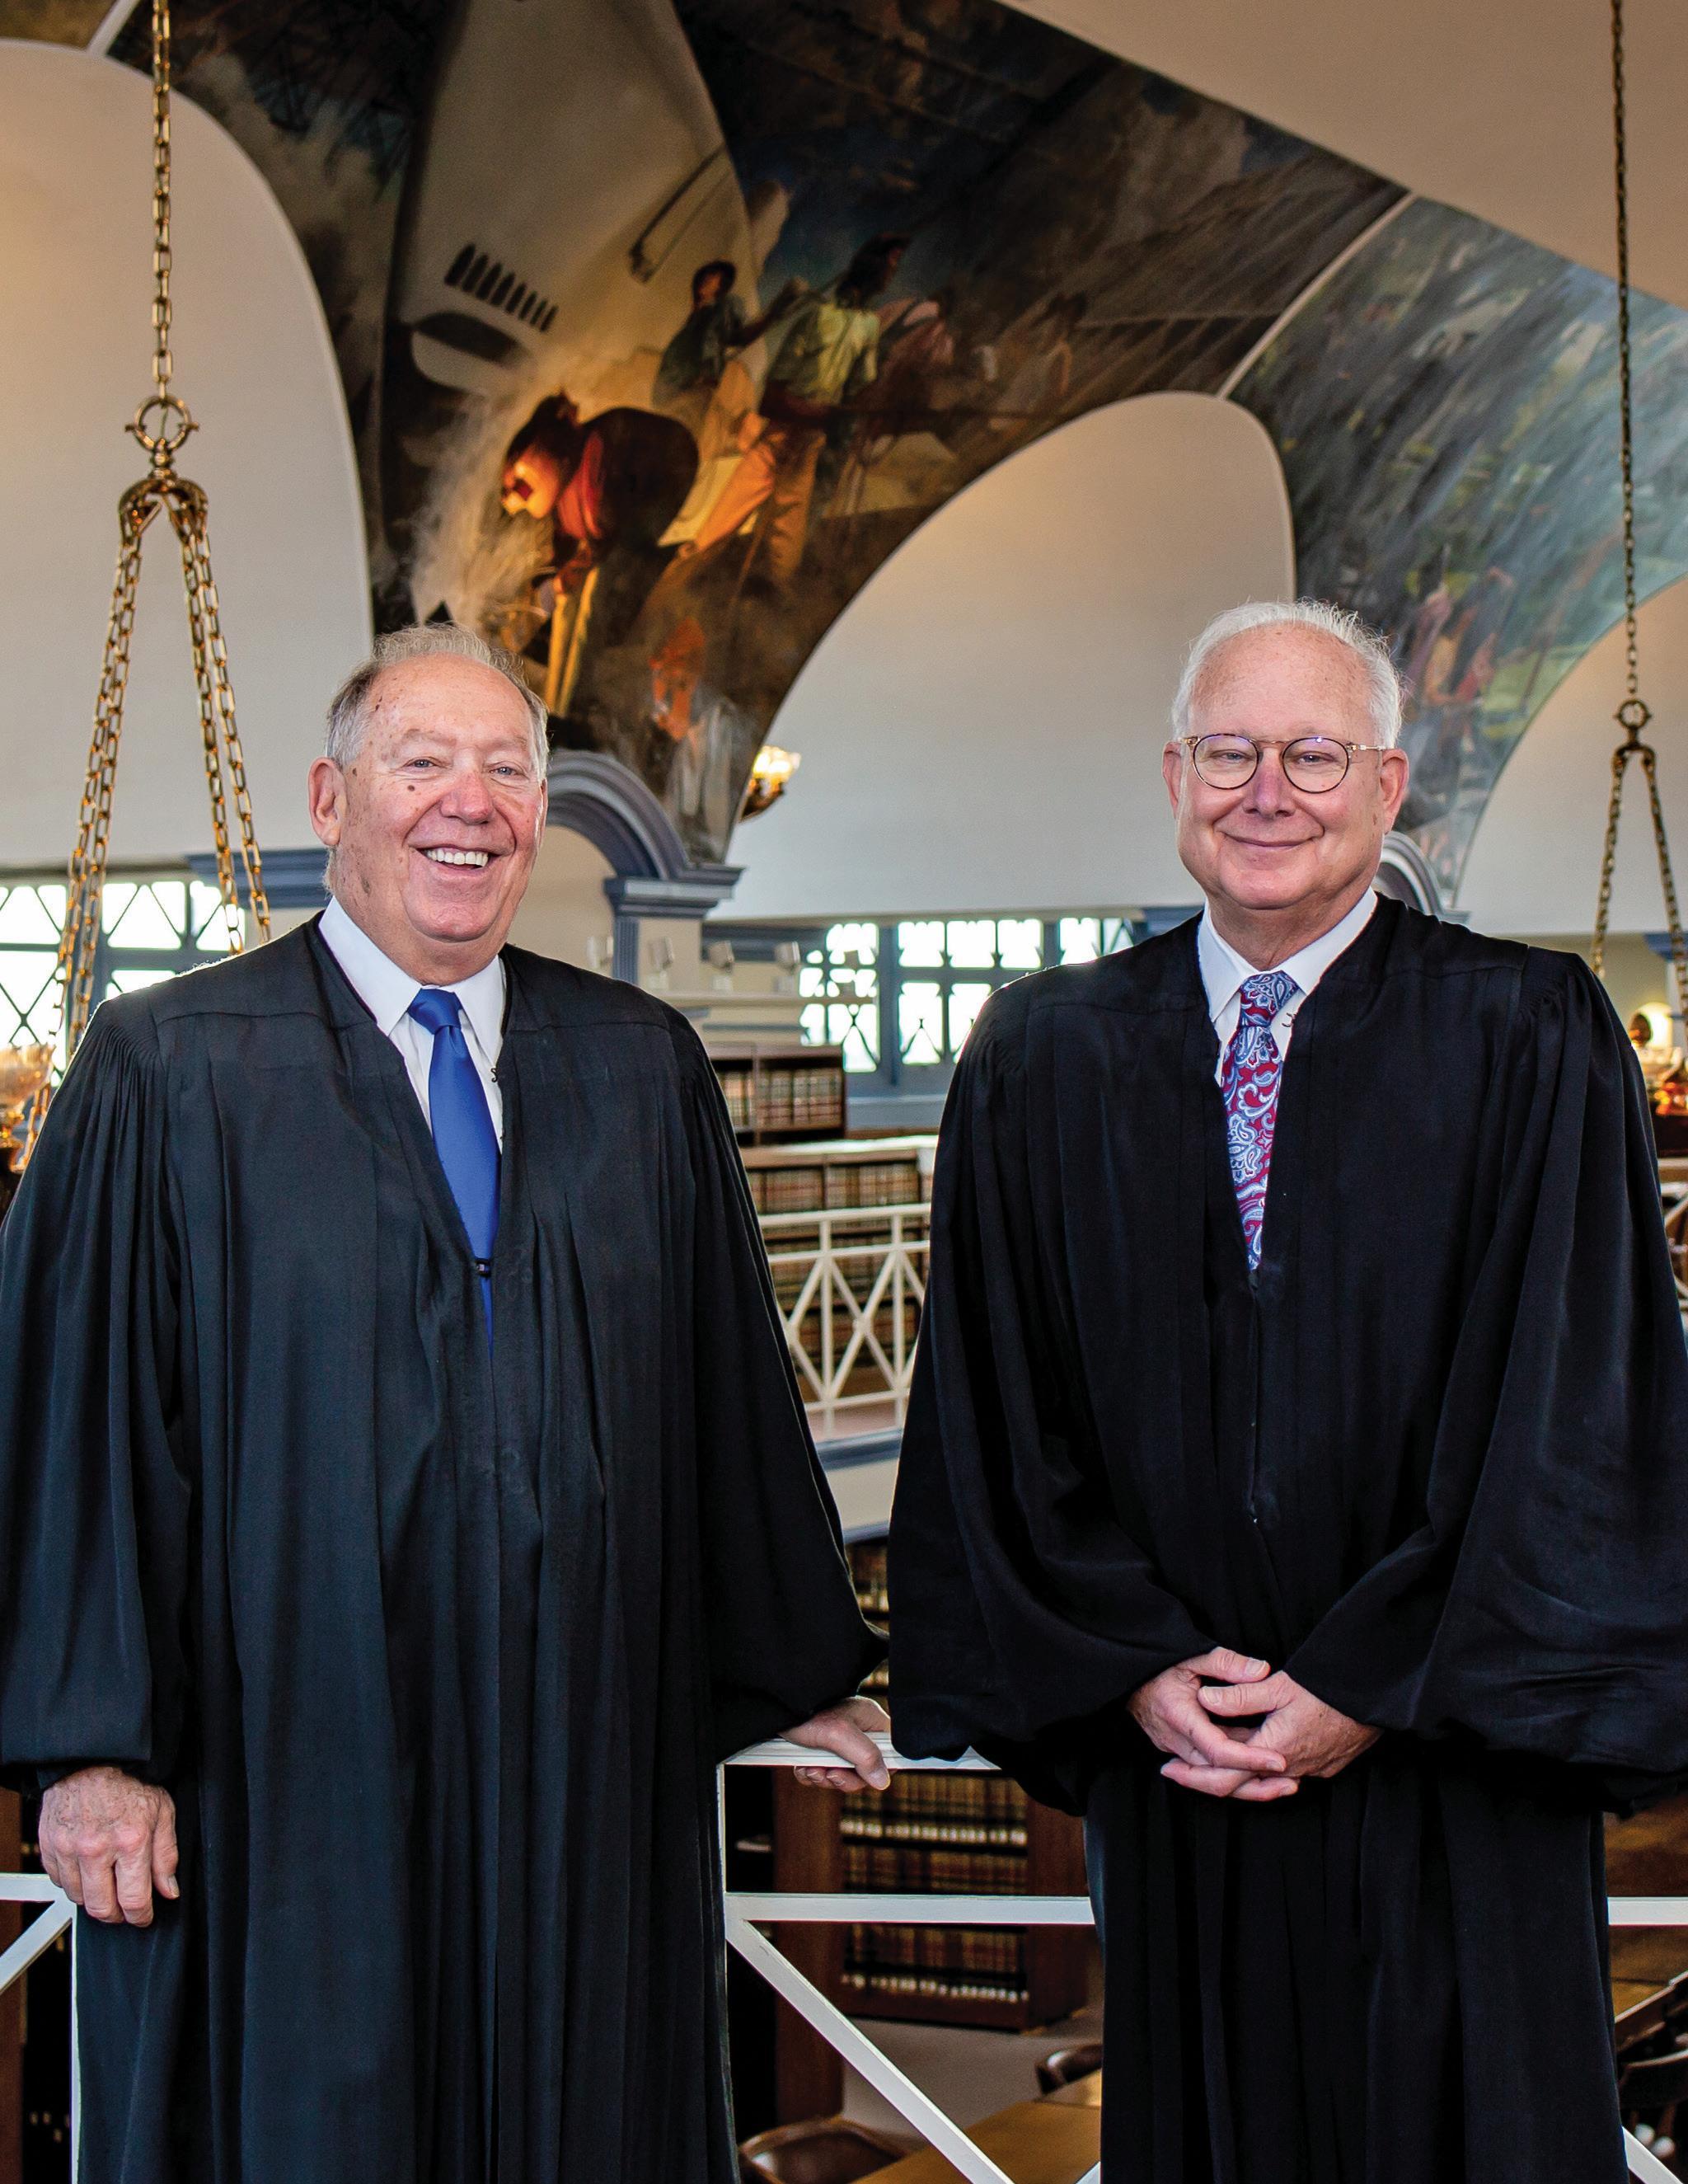 Page 1 of Judge John P. Capuzzi Sr. and Judge Barry C. Dozor